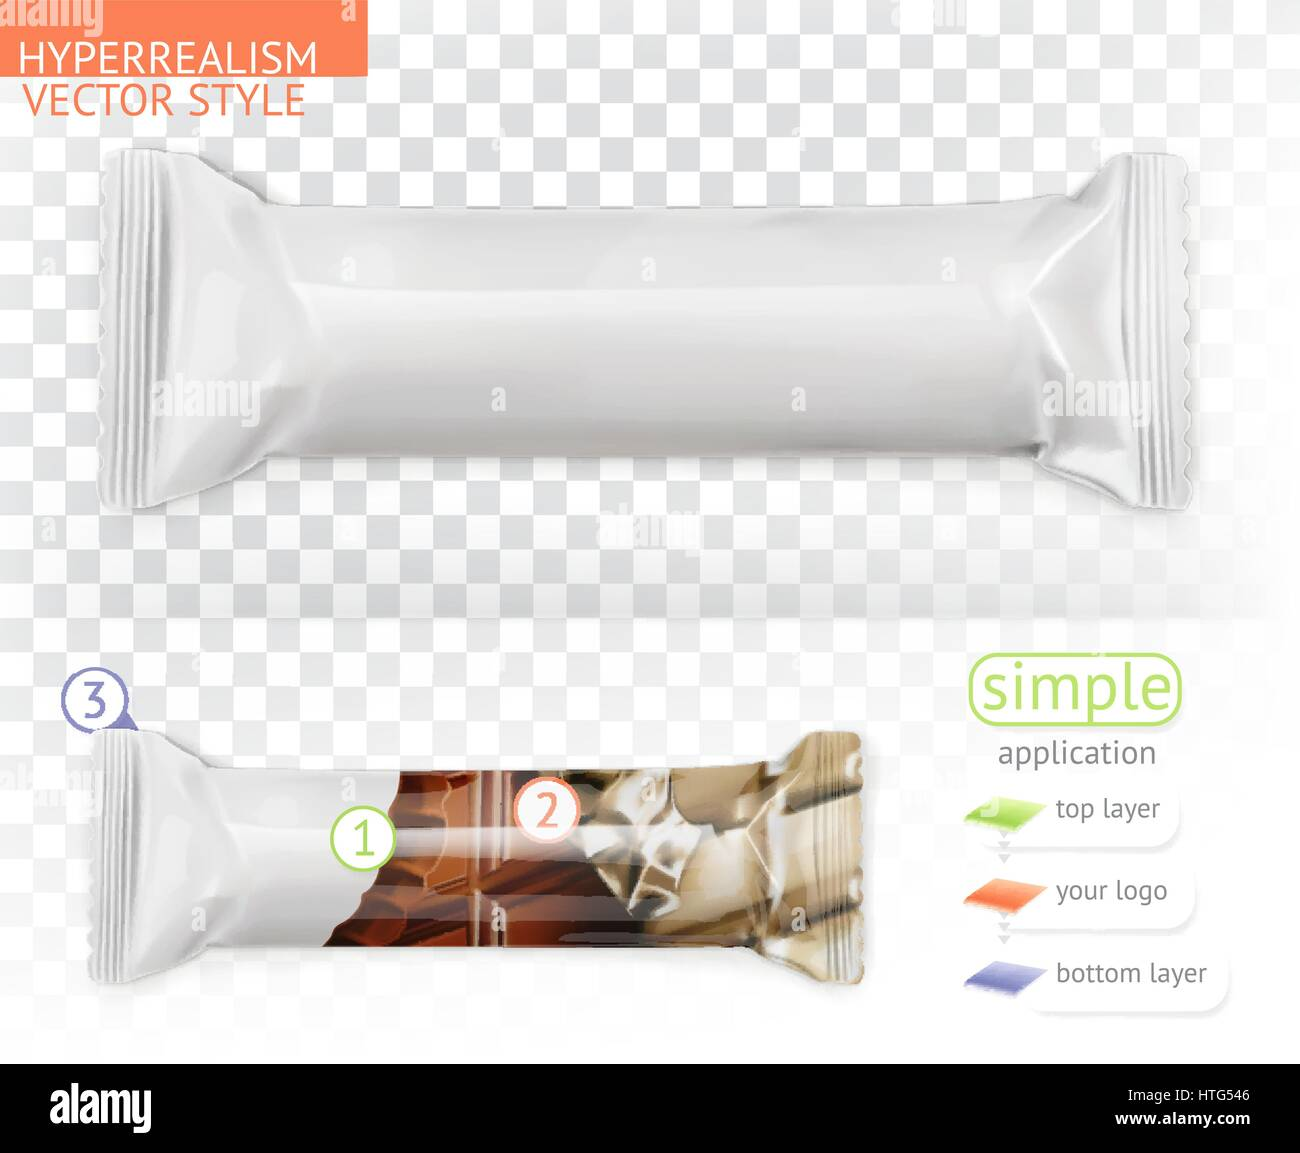 Chocolate bar, white polyethylene packaging. Hyperrealism vector style simple application - Stock Vector